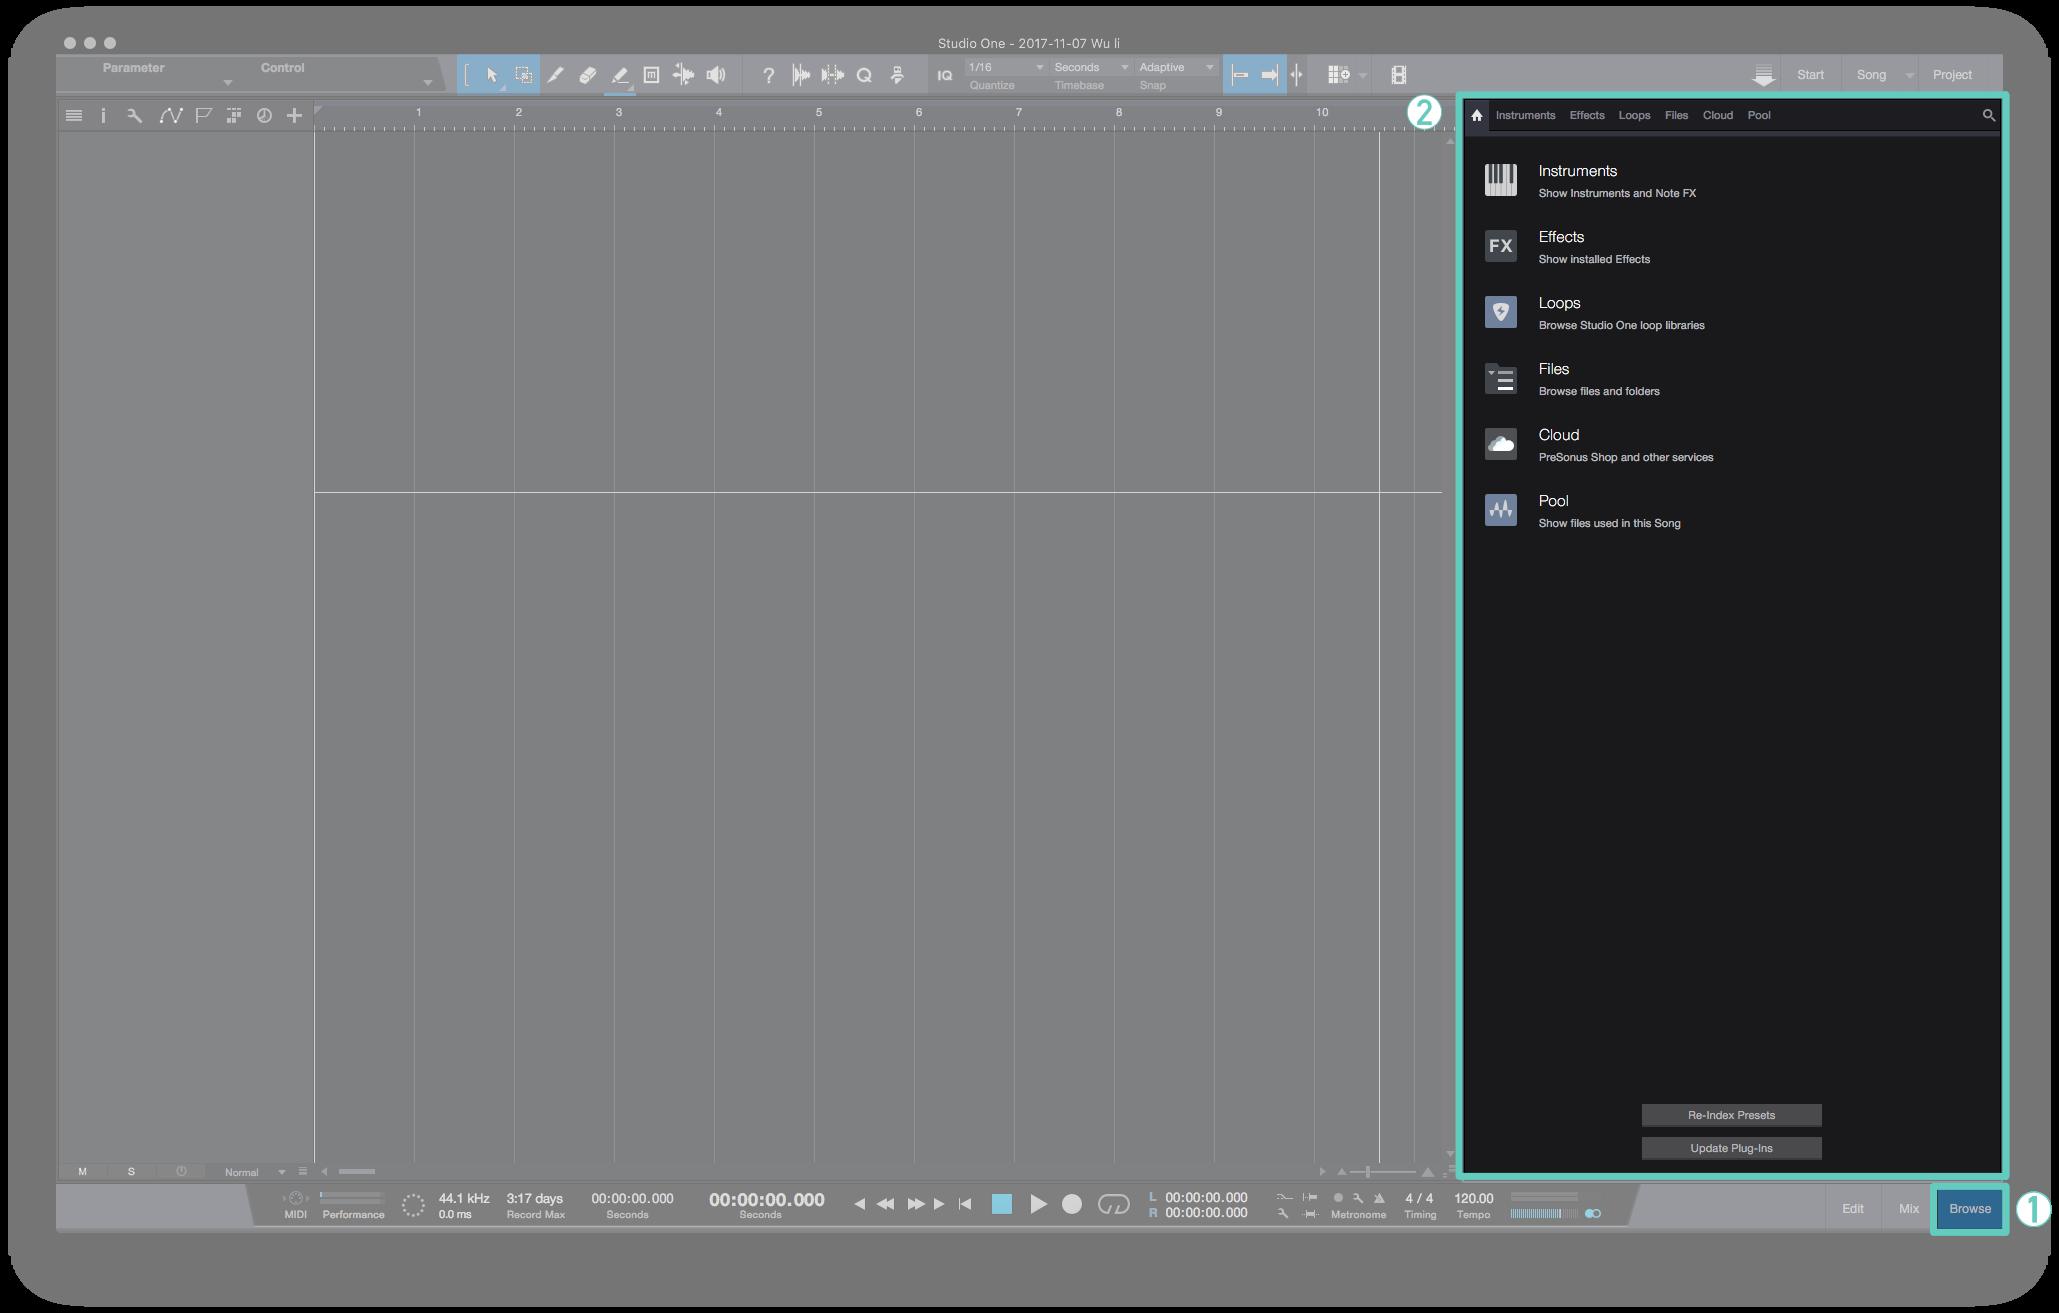 在 Studio One 的 Browse 的首頁中你可以看到 Instrument 與 Effect 、Loop ...等等的選項。